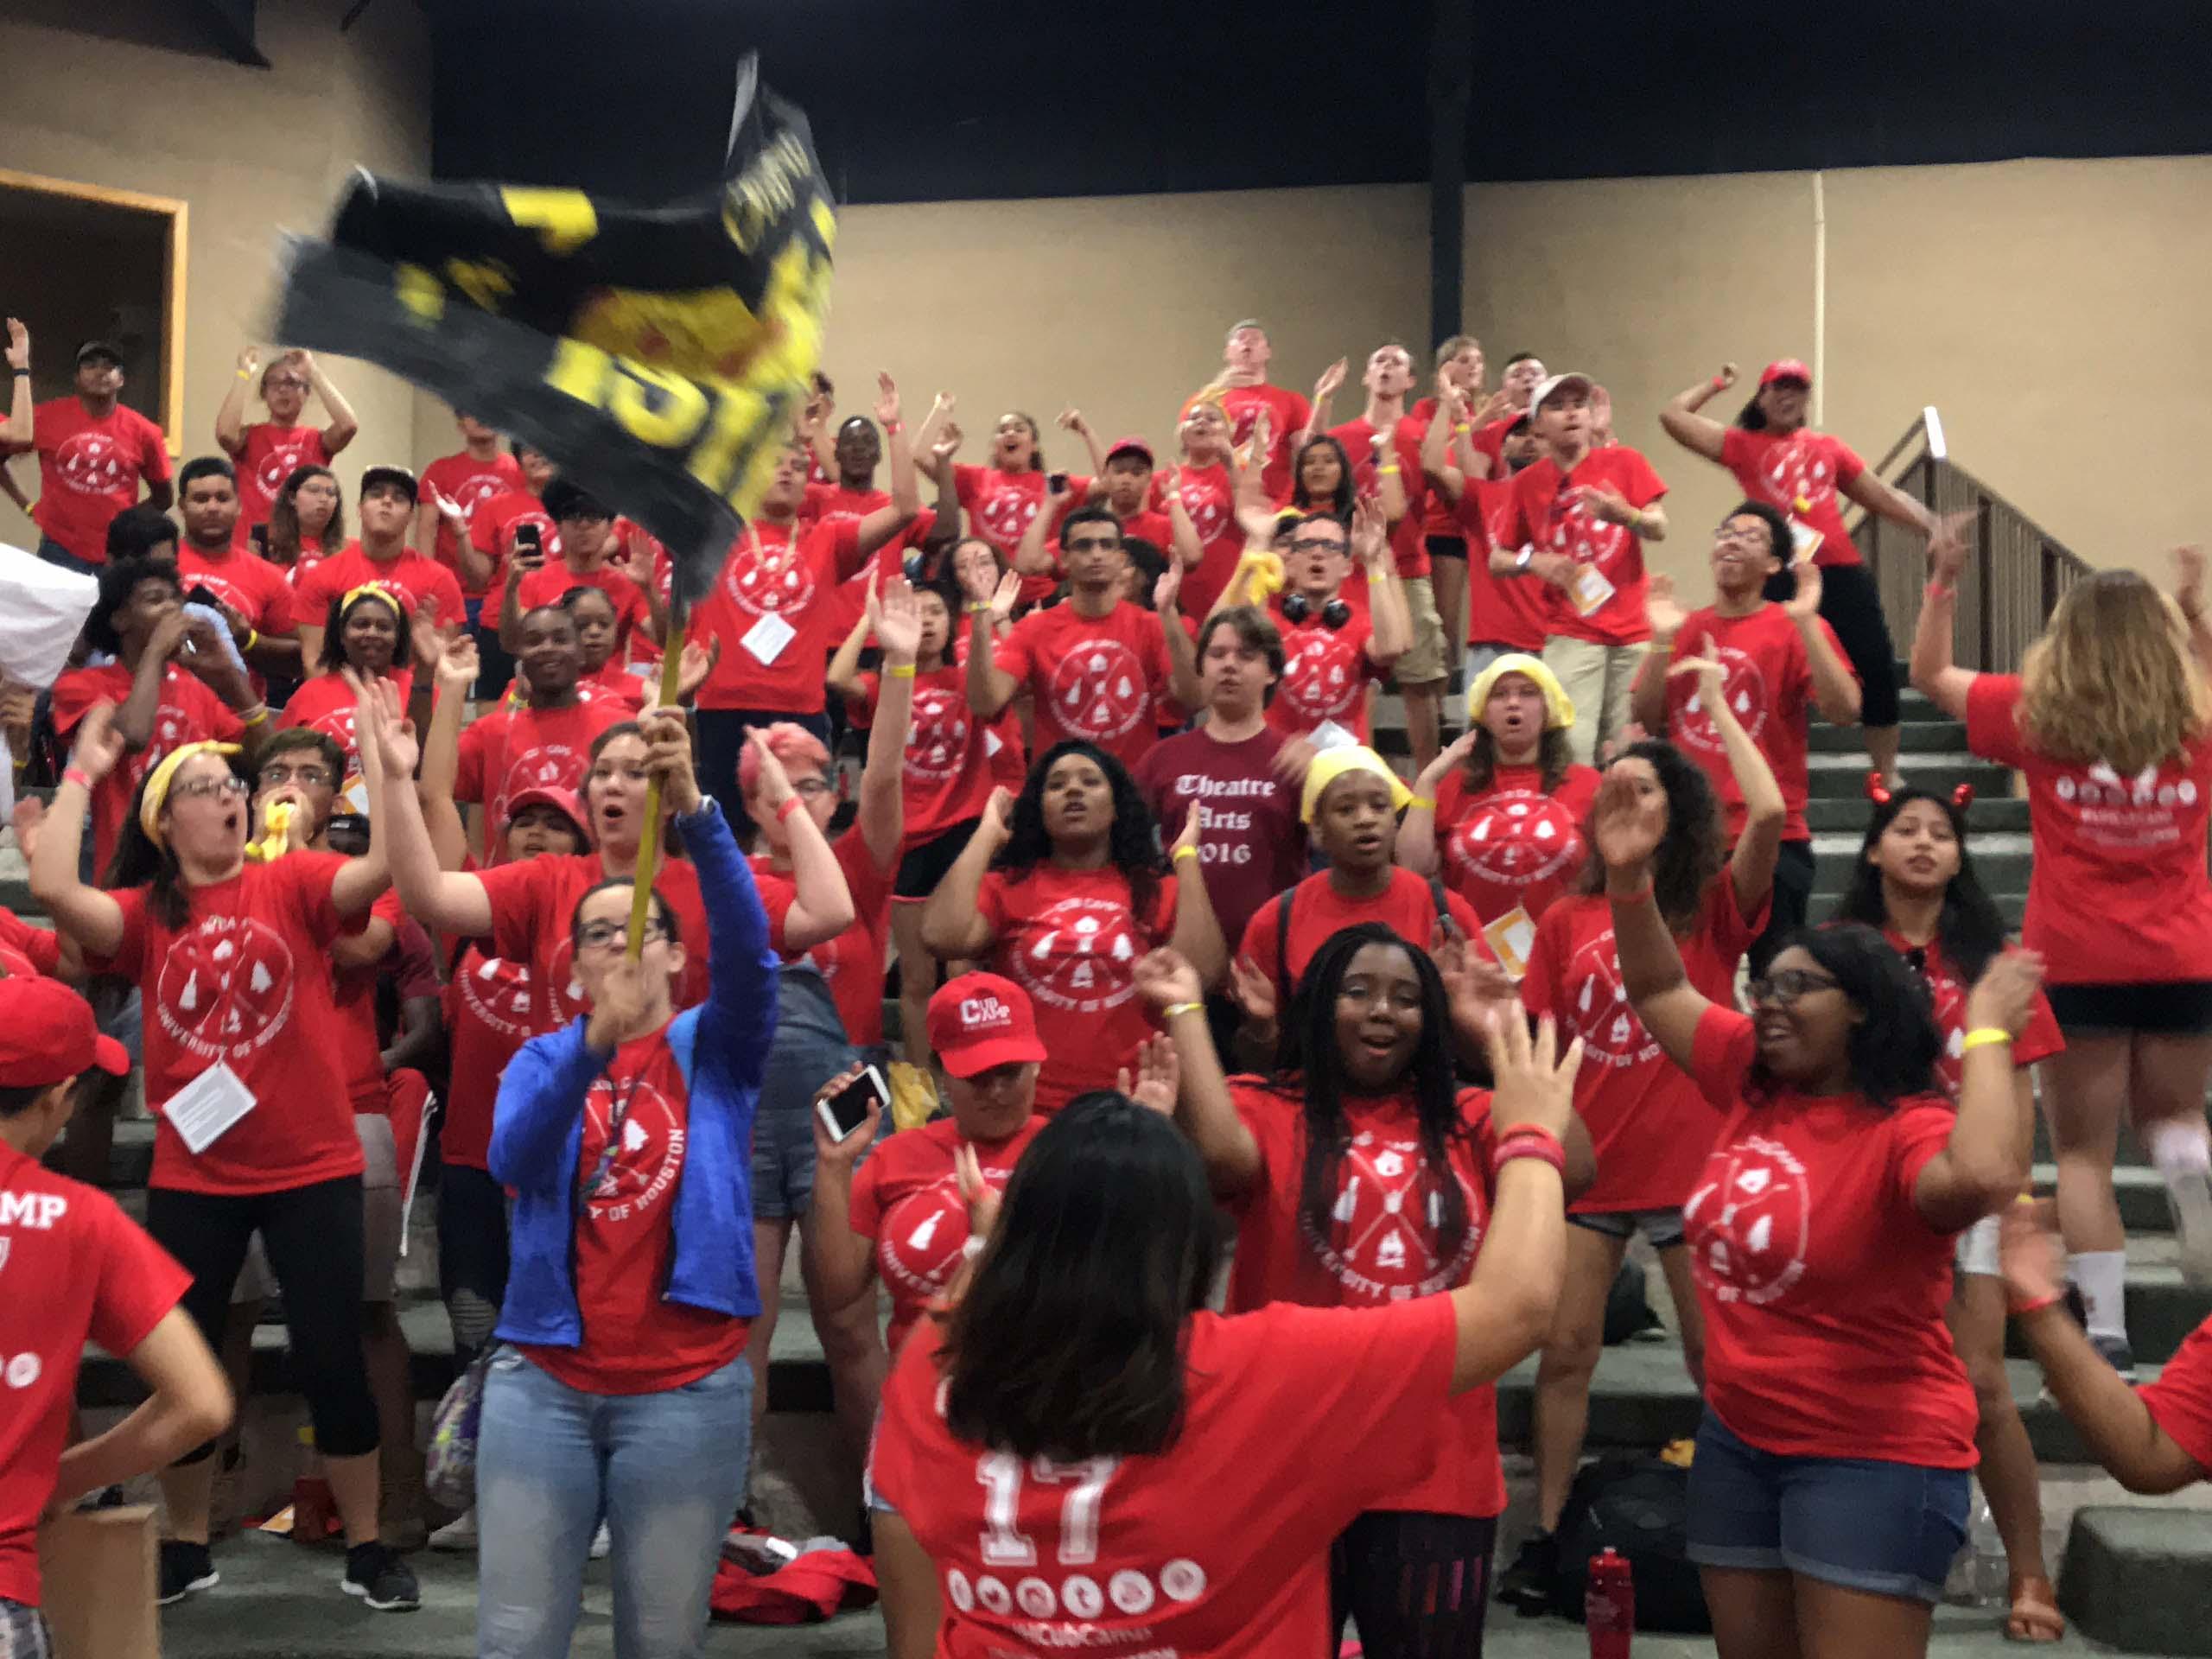 Cub Camp - University of Houston